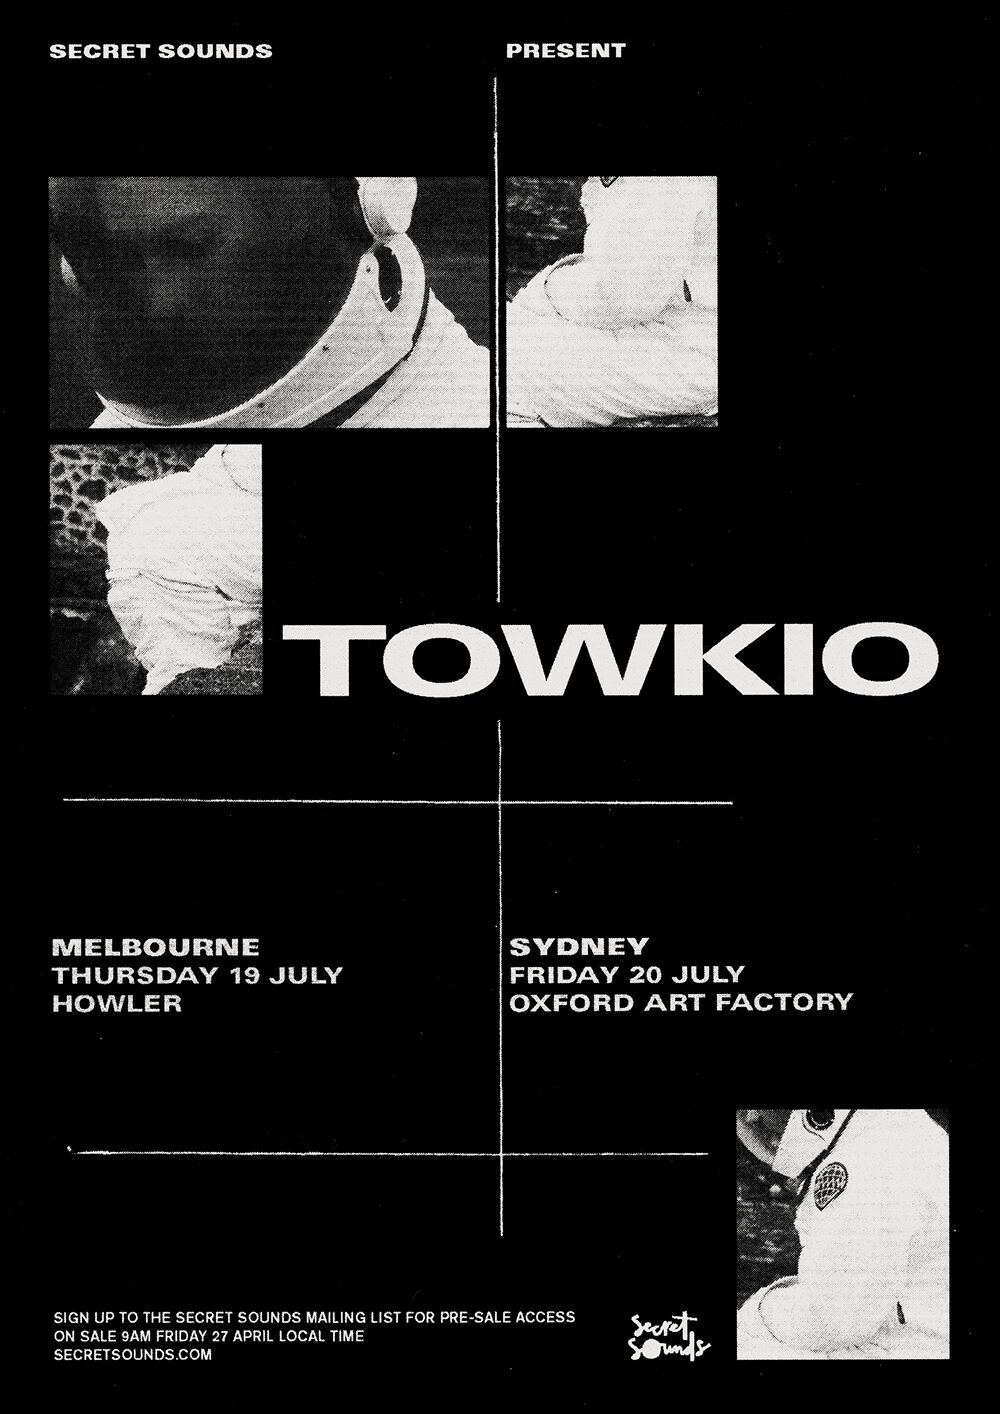 1818_SS_SecretSounds_Towkio_Poster_Web_1000x1414px_190418_preview.jpeg